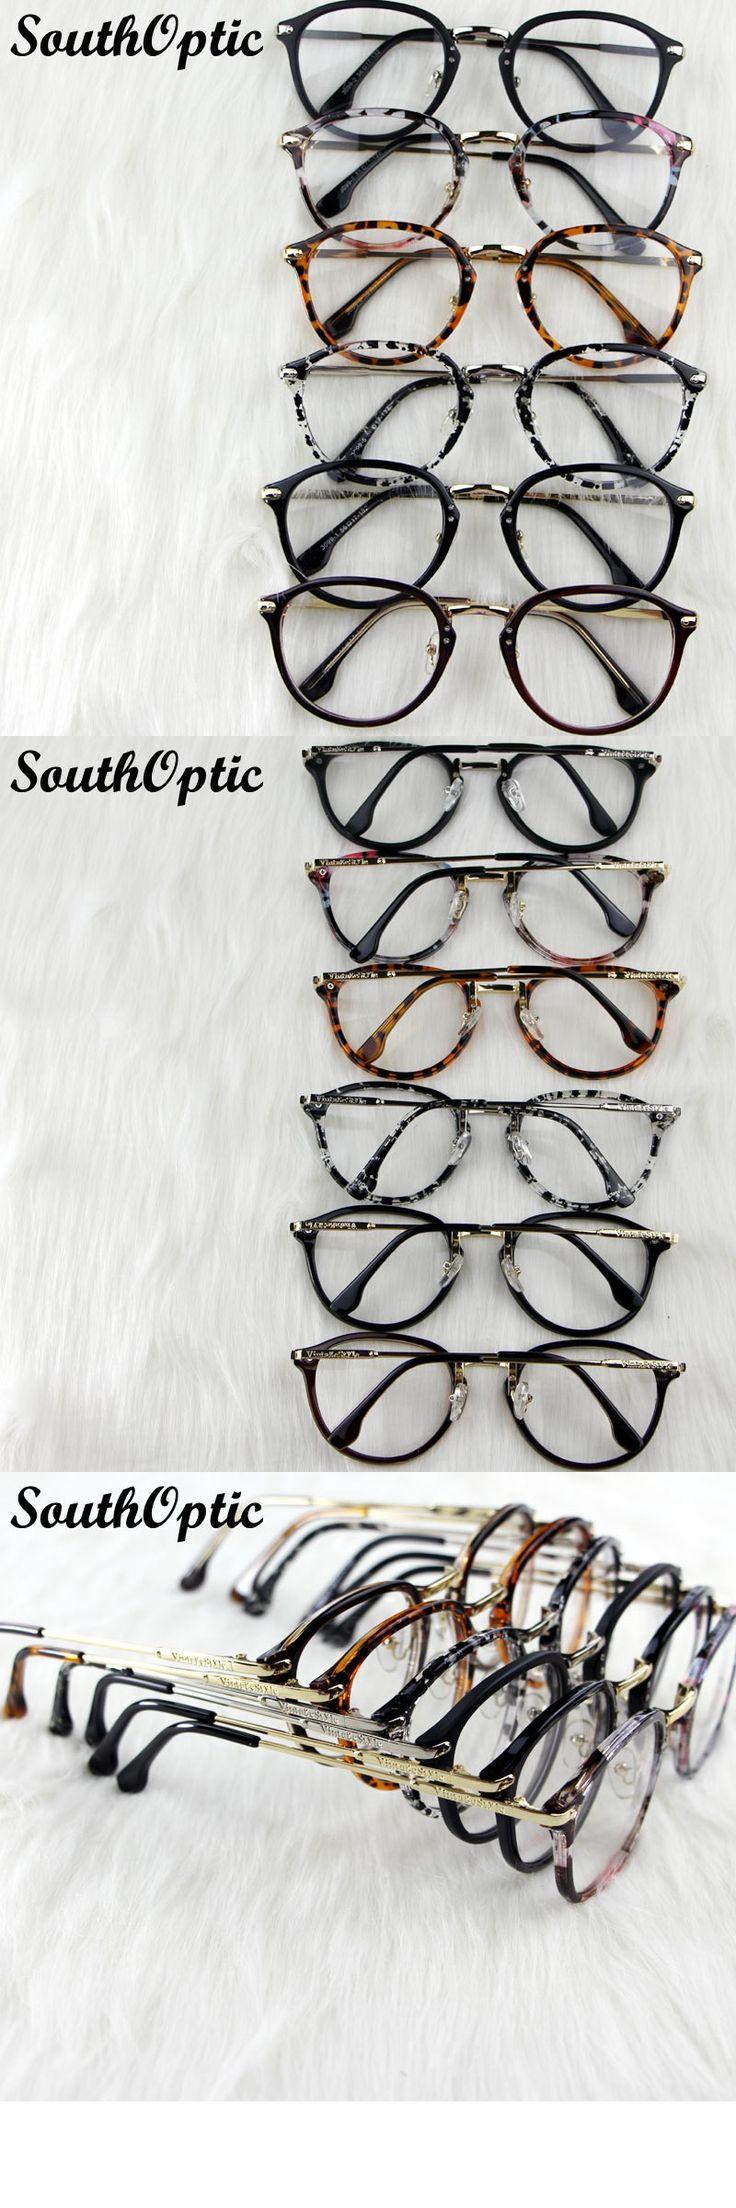 Super Light TR90 Glasses Prescription Women Full Rim Eyeglasses Frames oculos receituario marco ojos Glasses Frames For Men 3099 $13.99